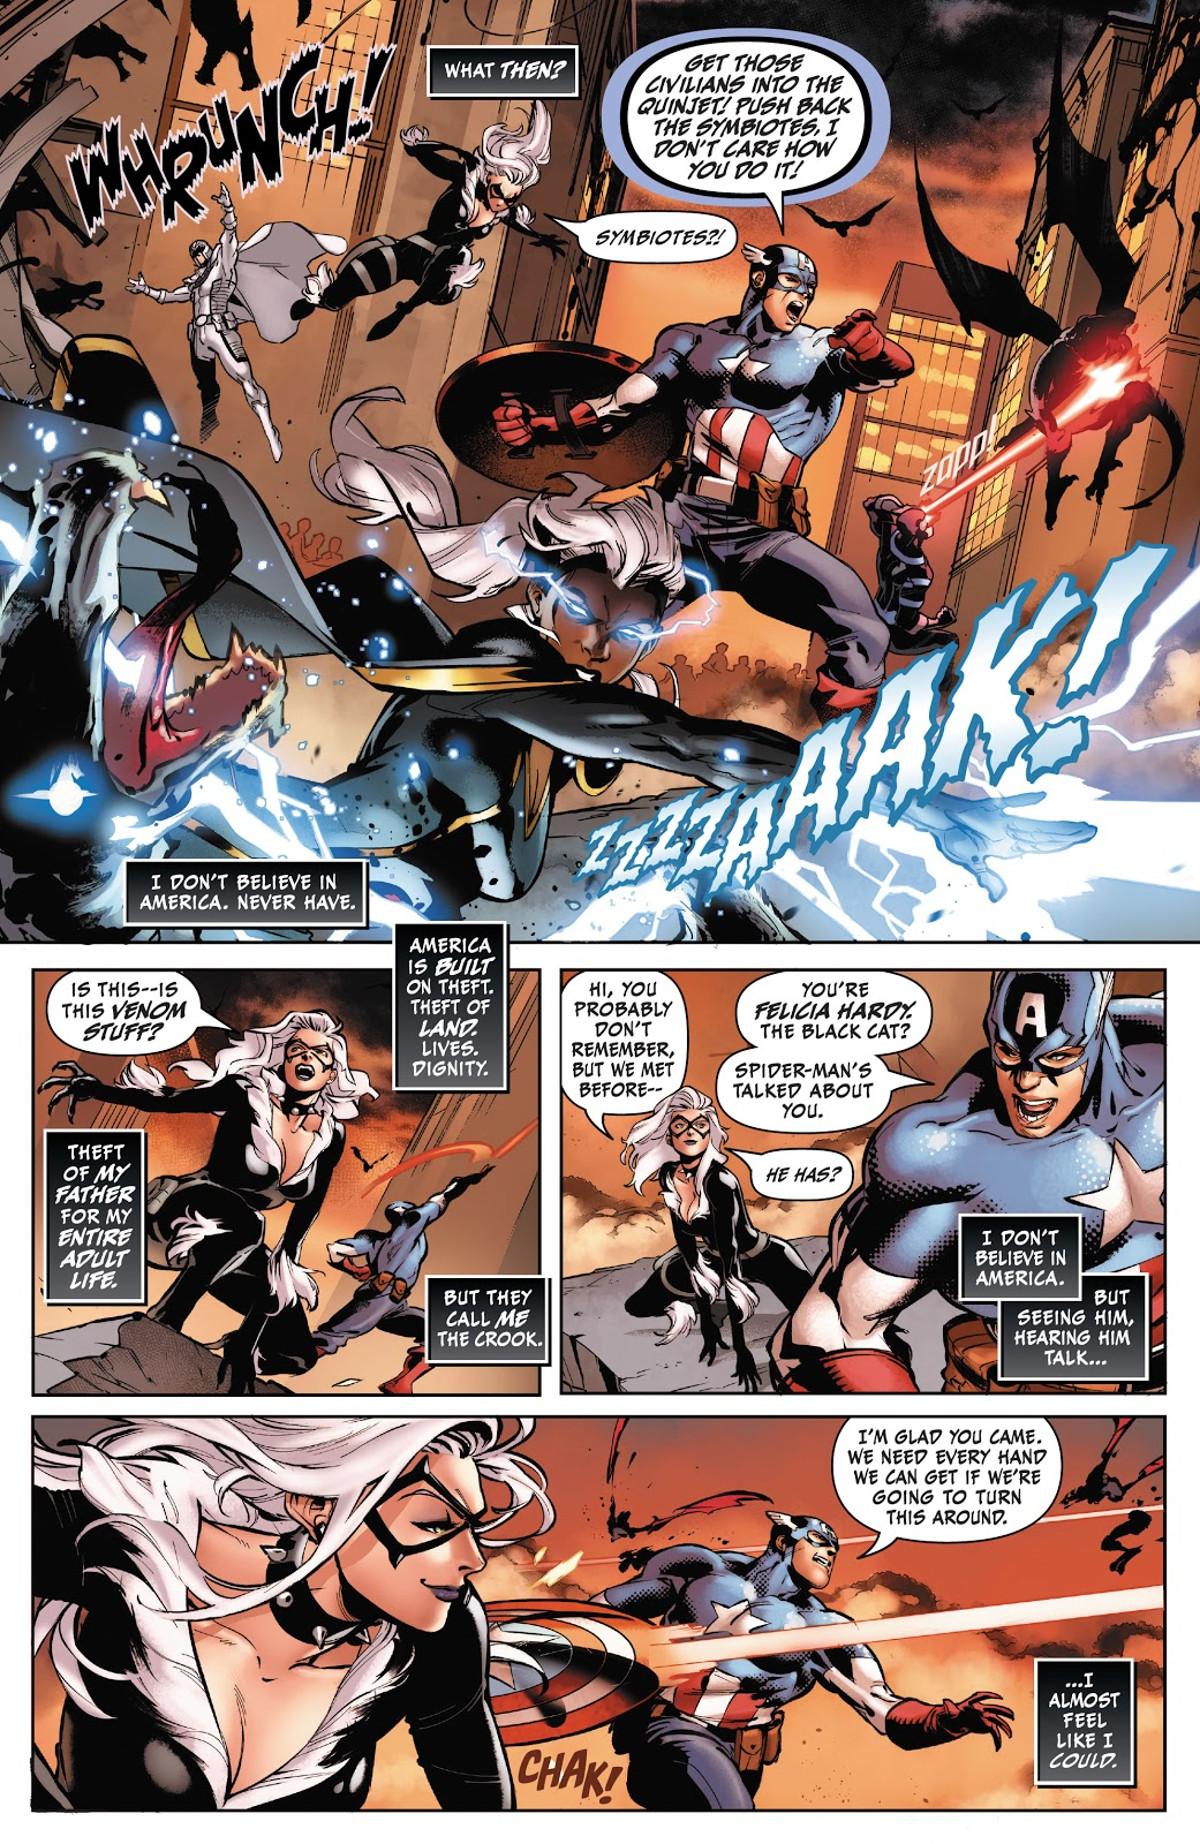 Black Cat 2020 #1 Page 1